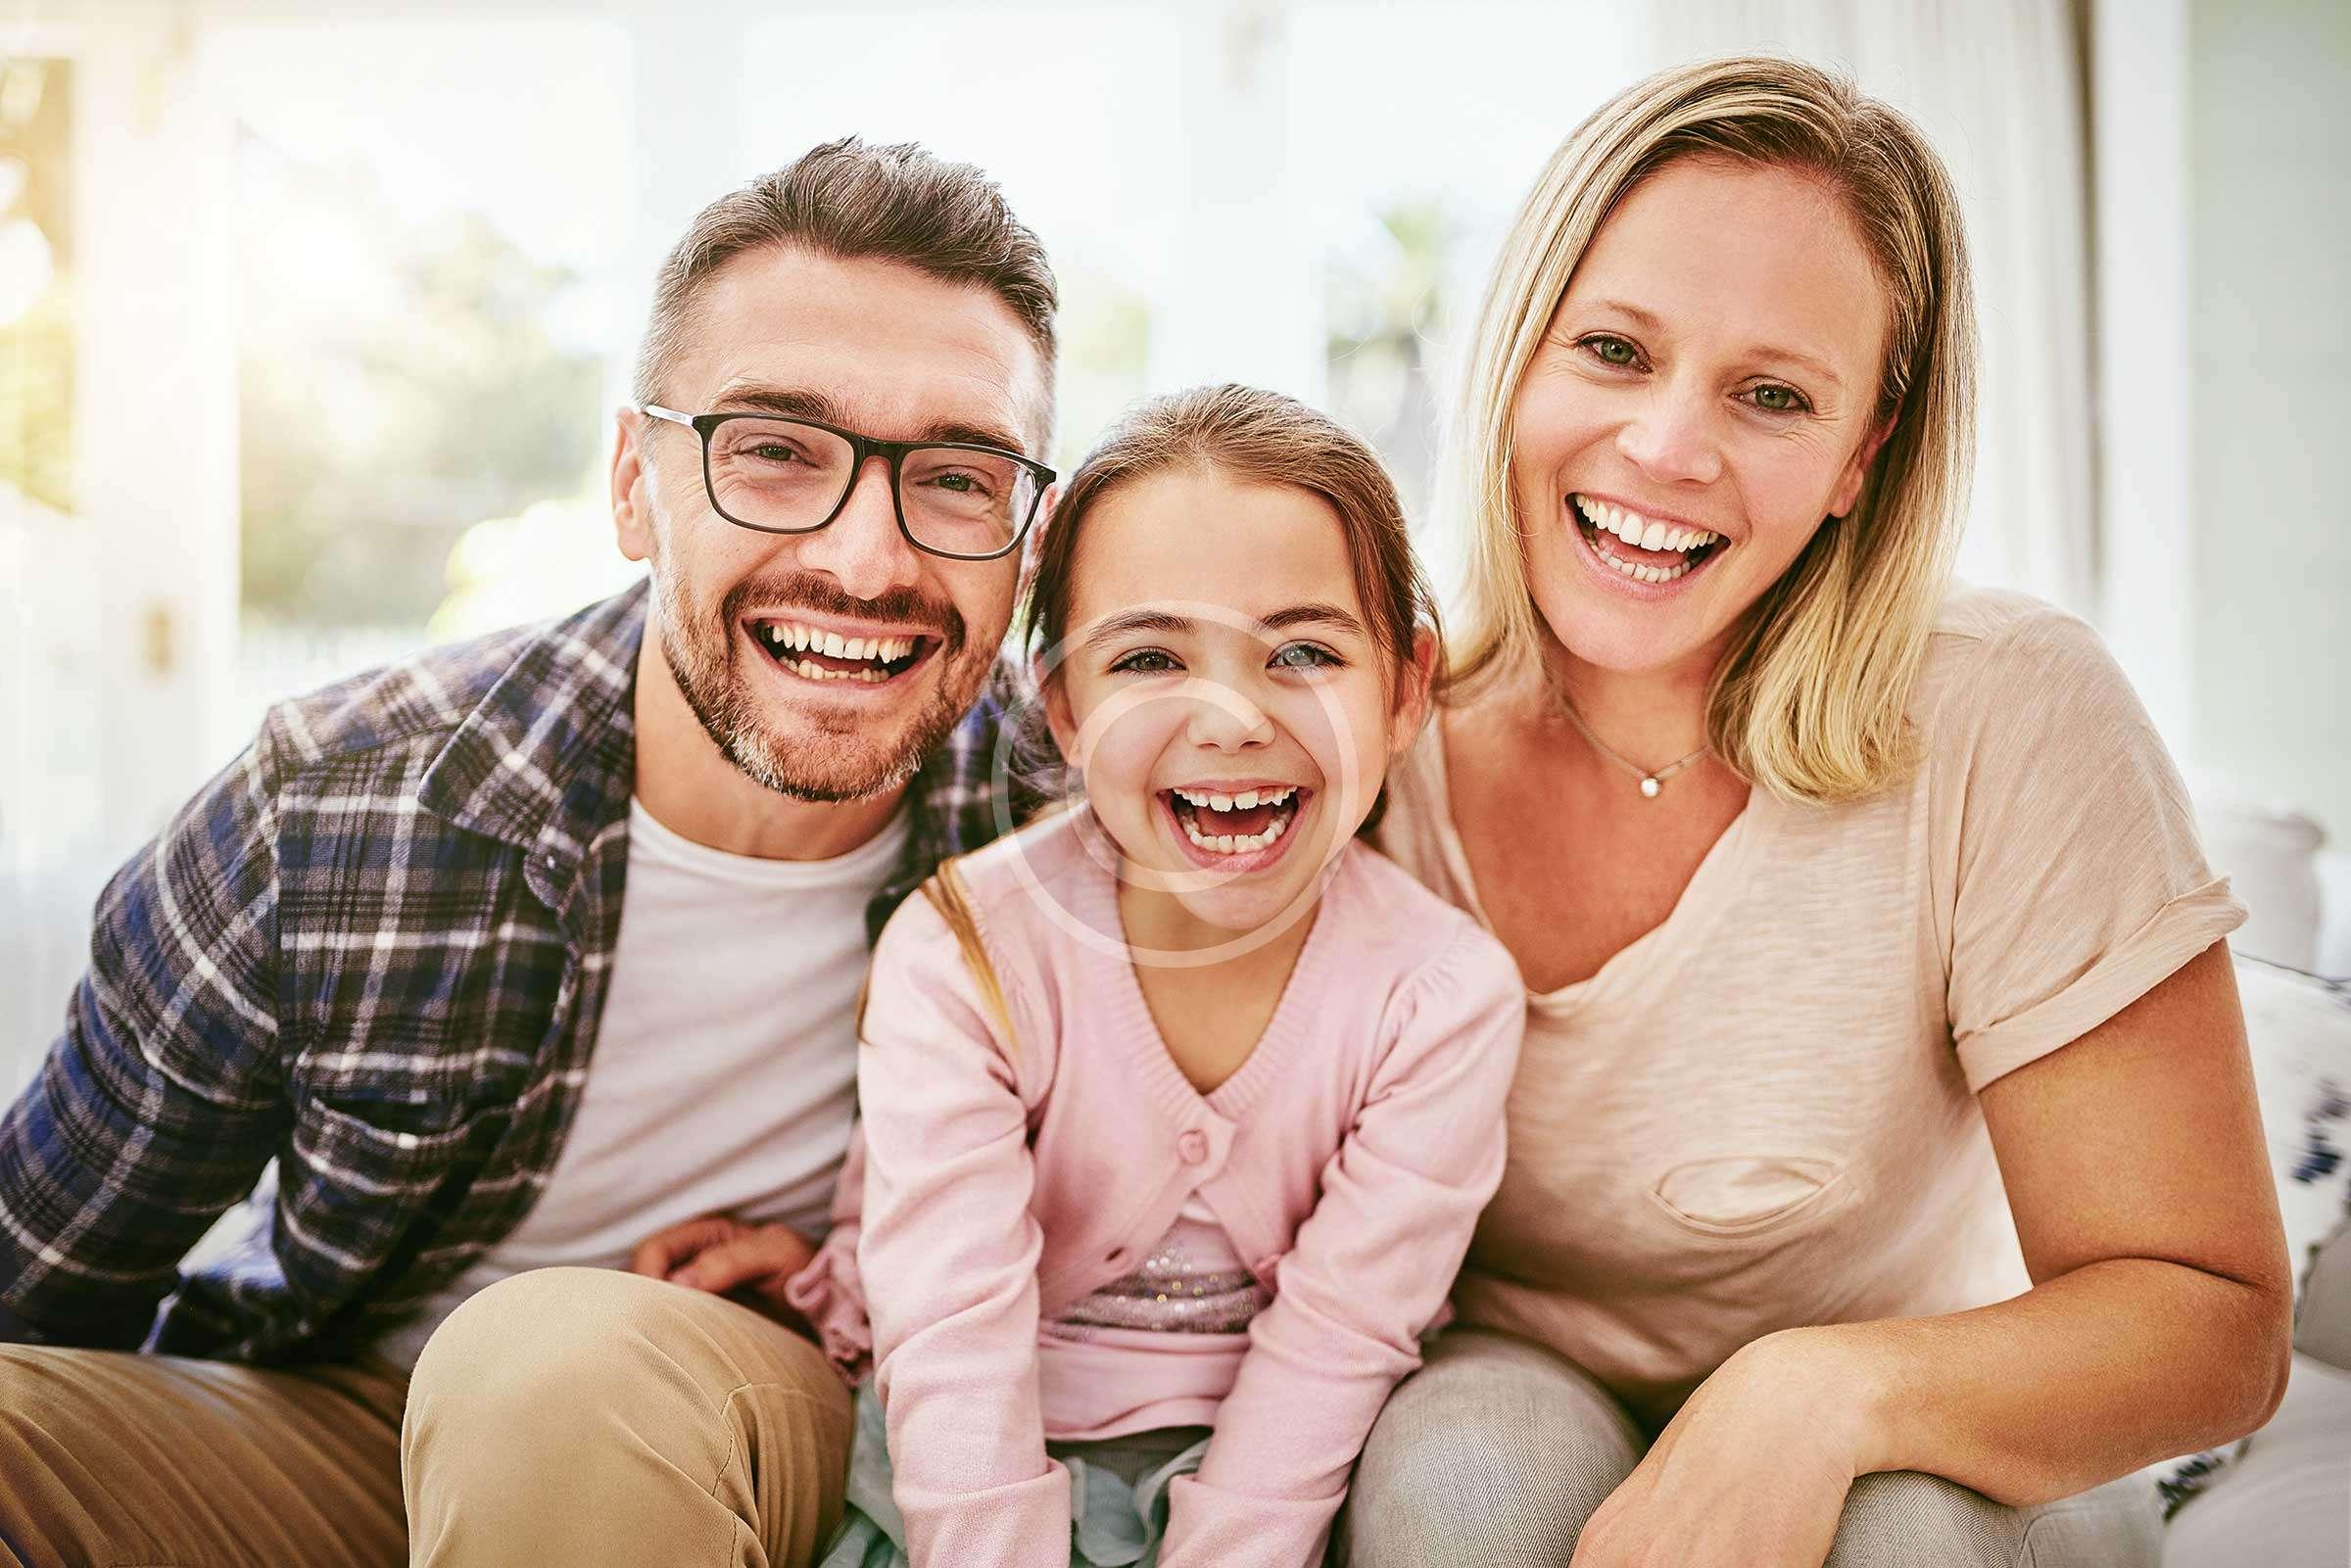 10 Life Insurance Benefits to Make it Worth Living